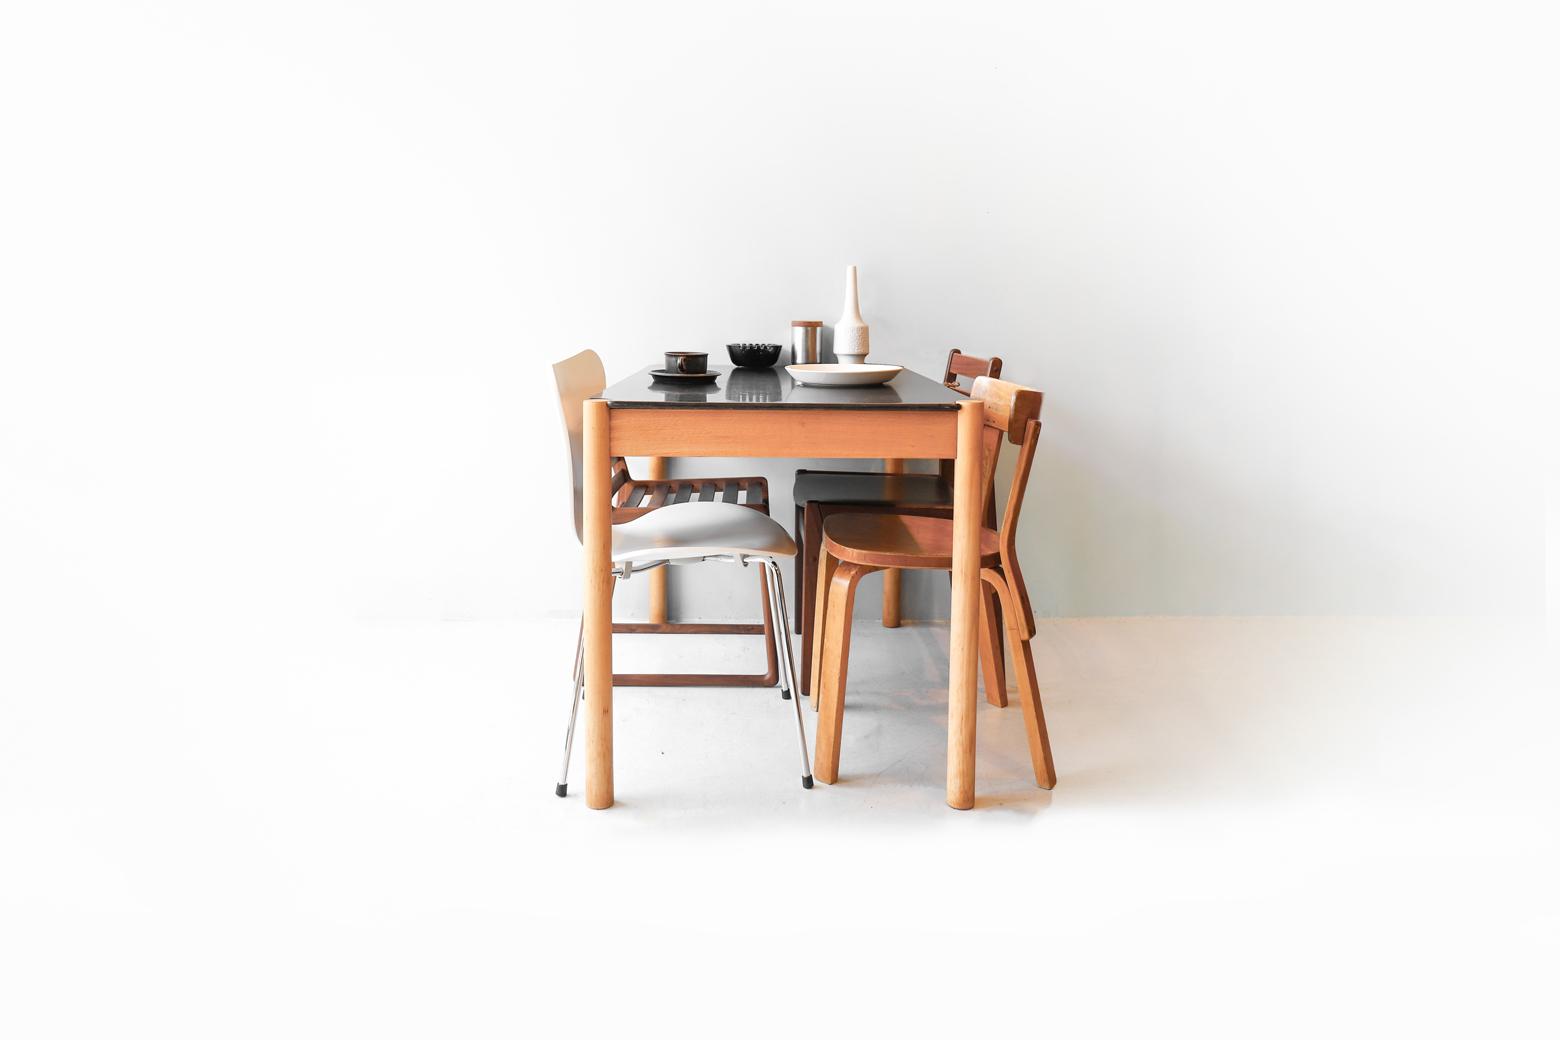 FDB Møbler Dining Table C44 Jorgen Baekmark/FDBモブラー ダイニングテーブル ヨーゲン・ベックマーク ヴィンテージ デンマーク 北欧家具